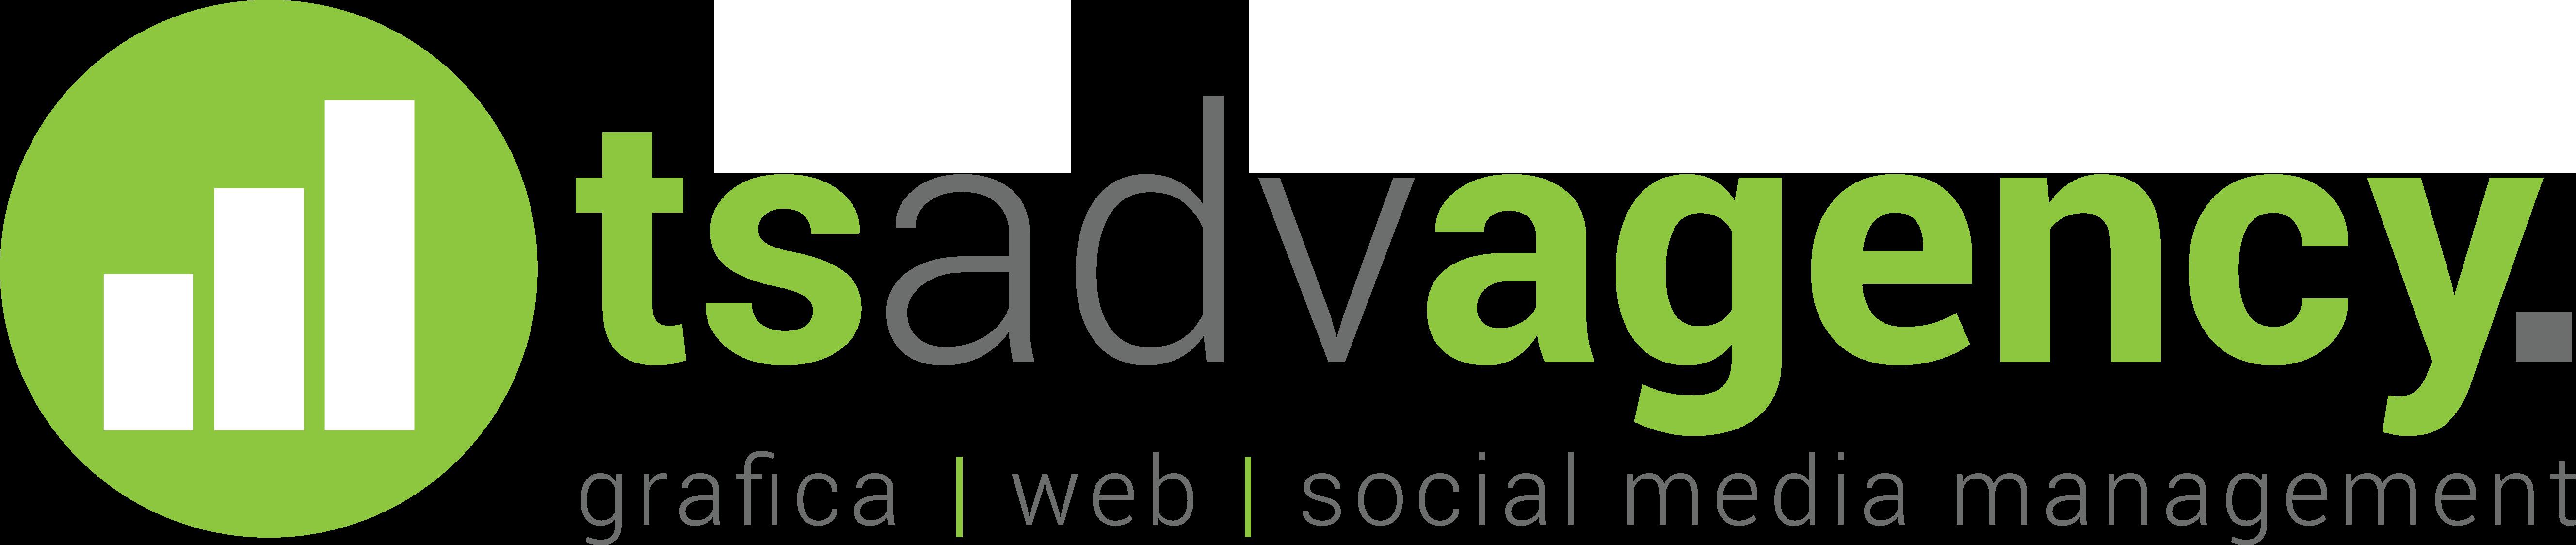 TS ADV AGENCY - logo